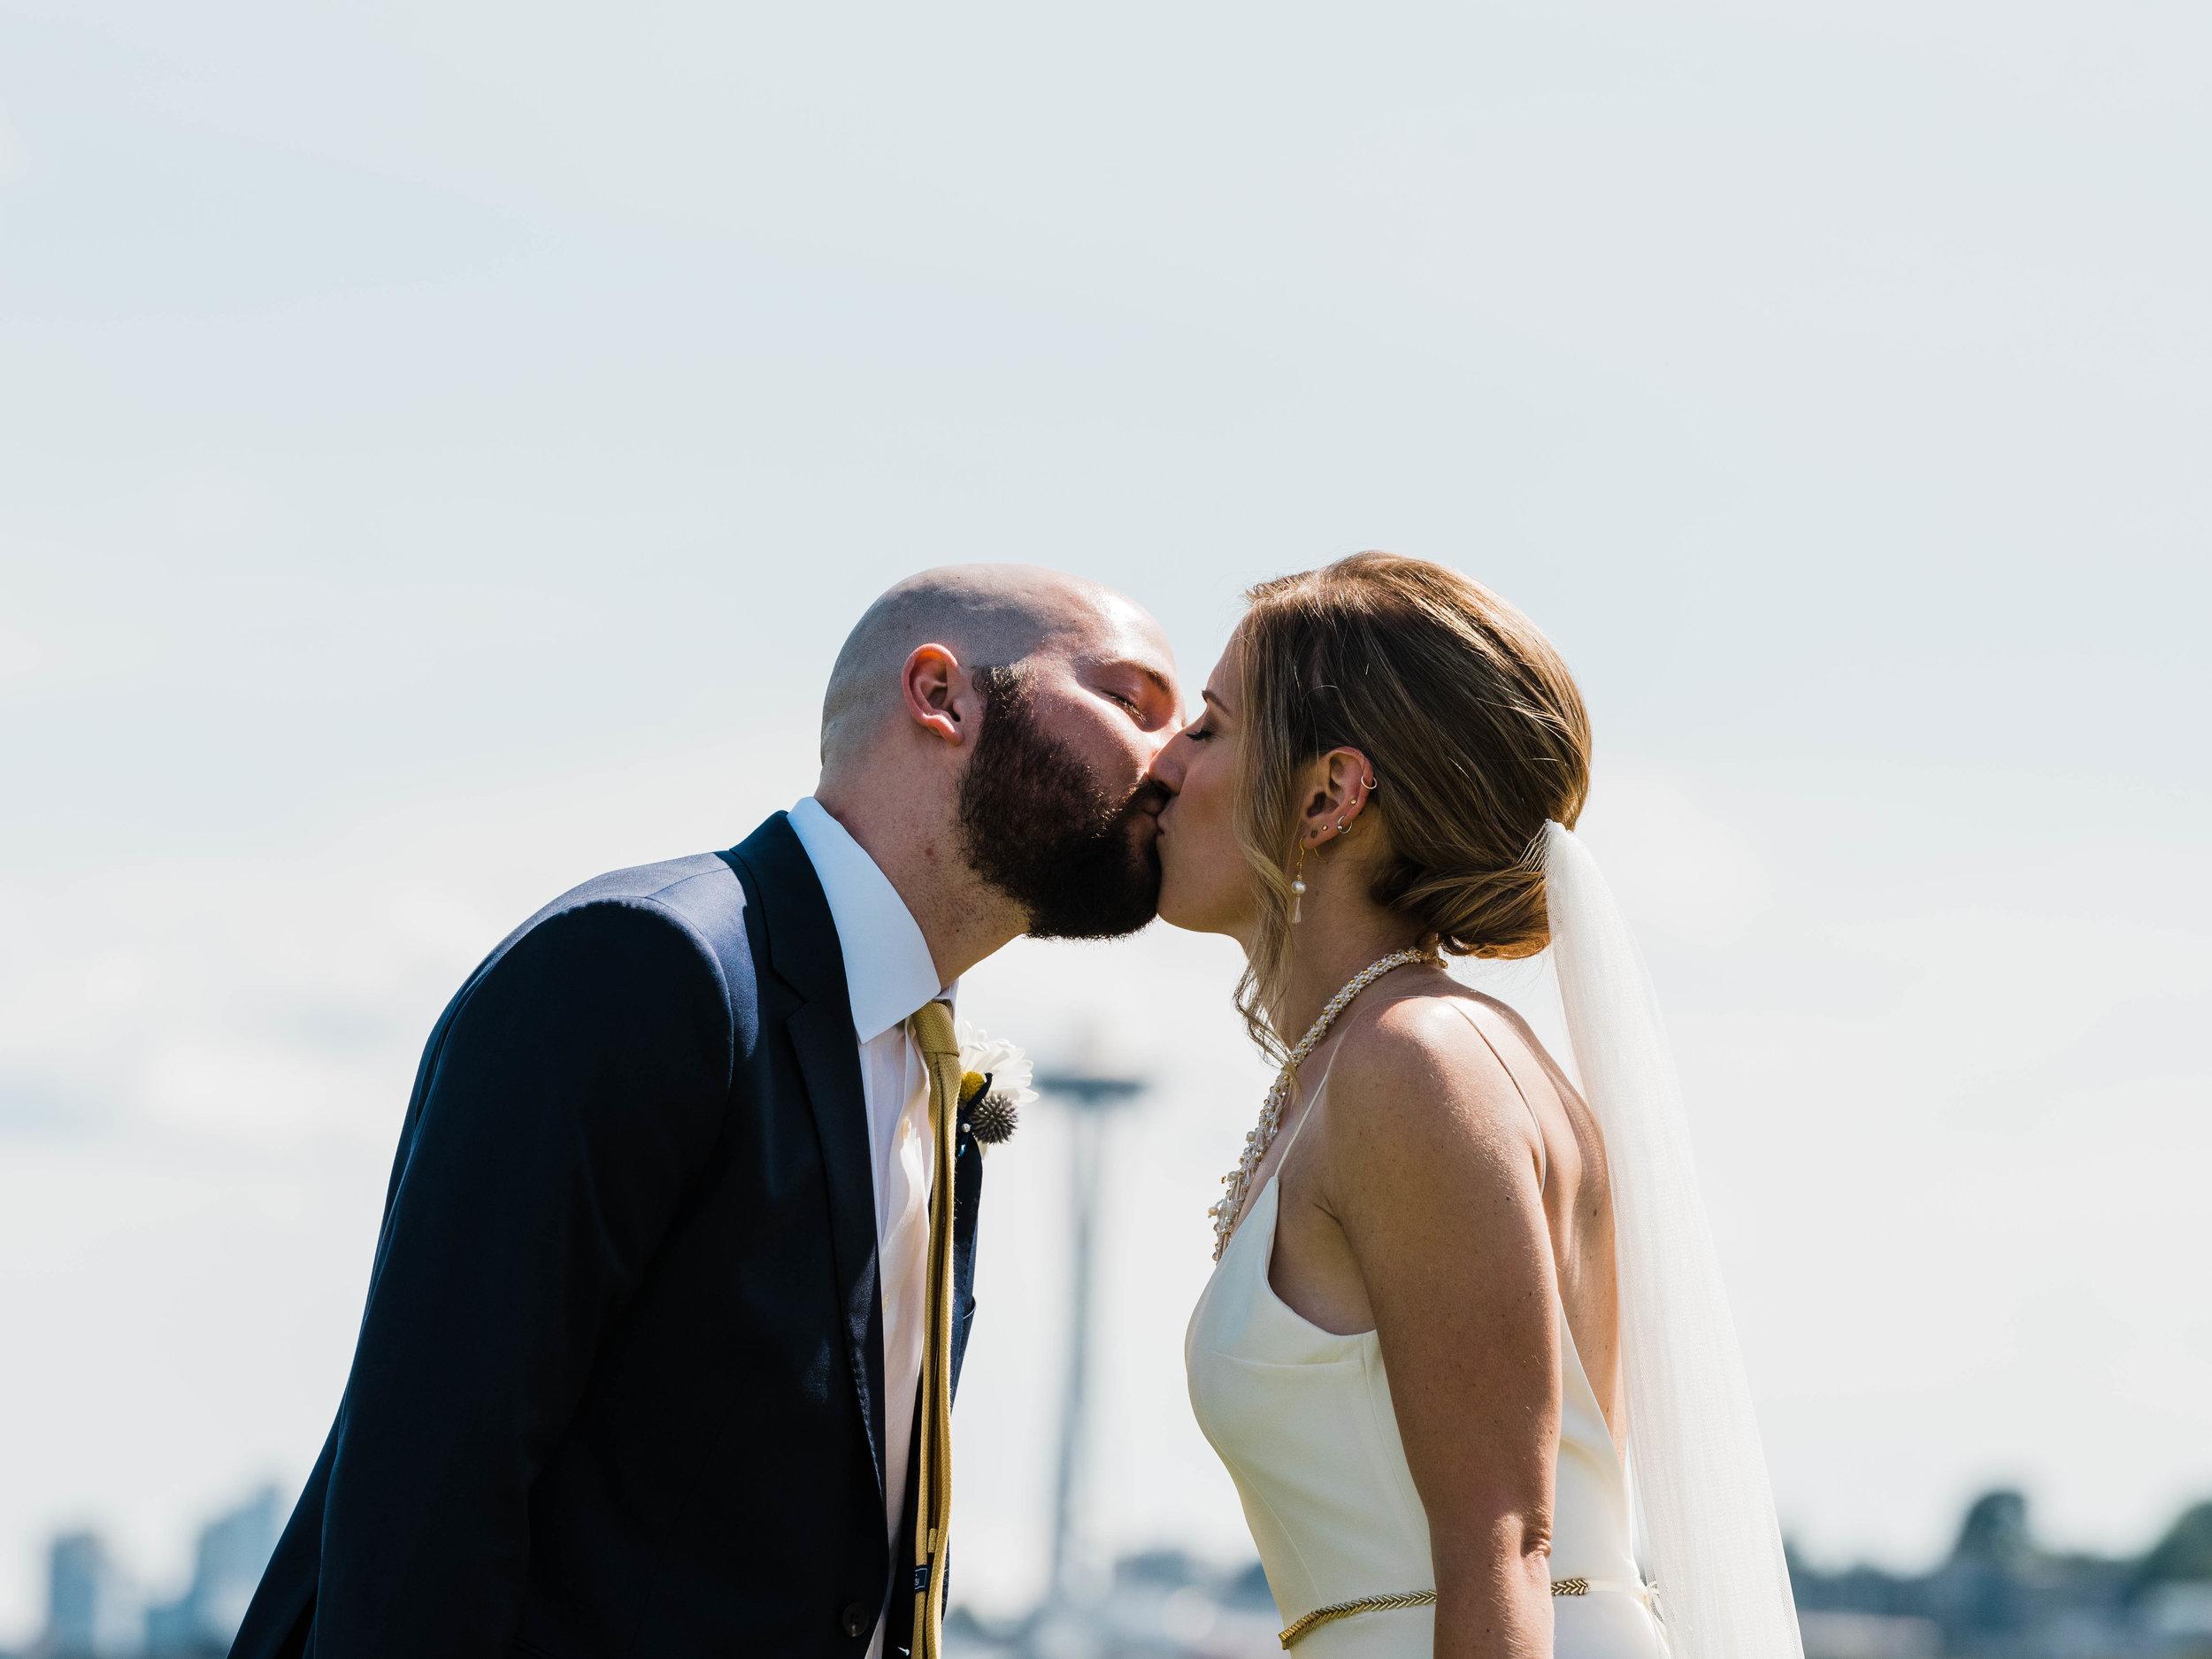 Seattle Wedding- MV Skansonia - Anna + Josh -  (822) - Copy.jpg